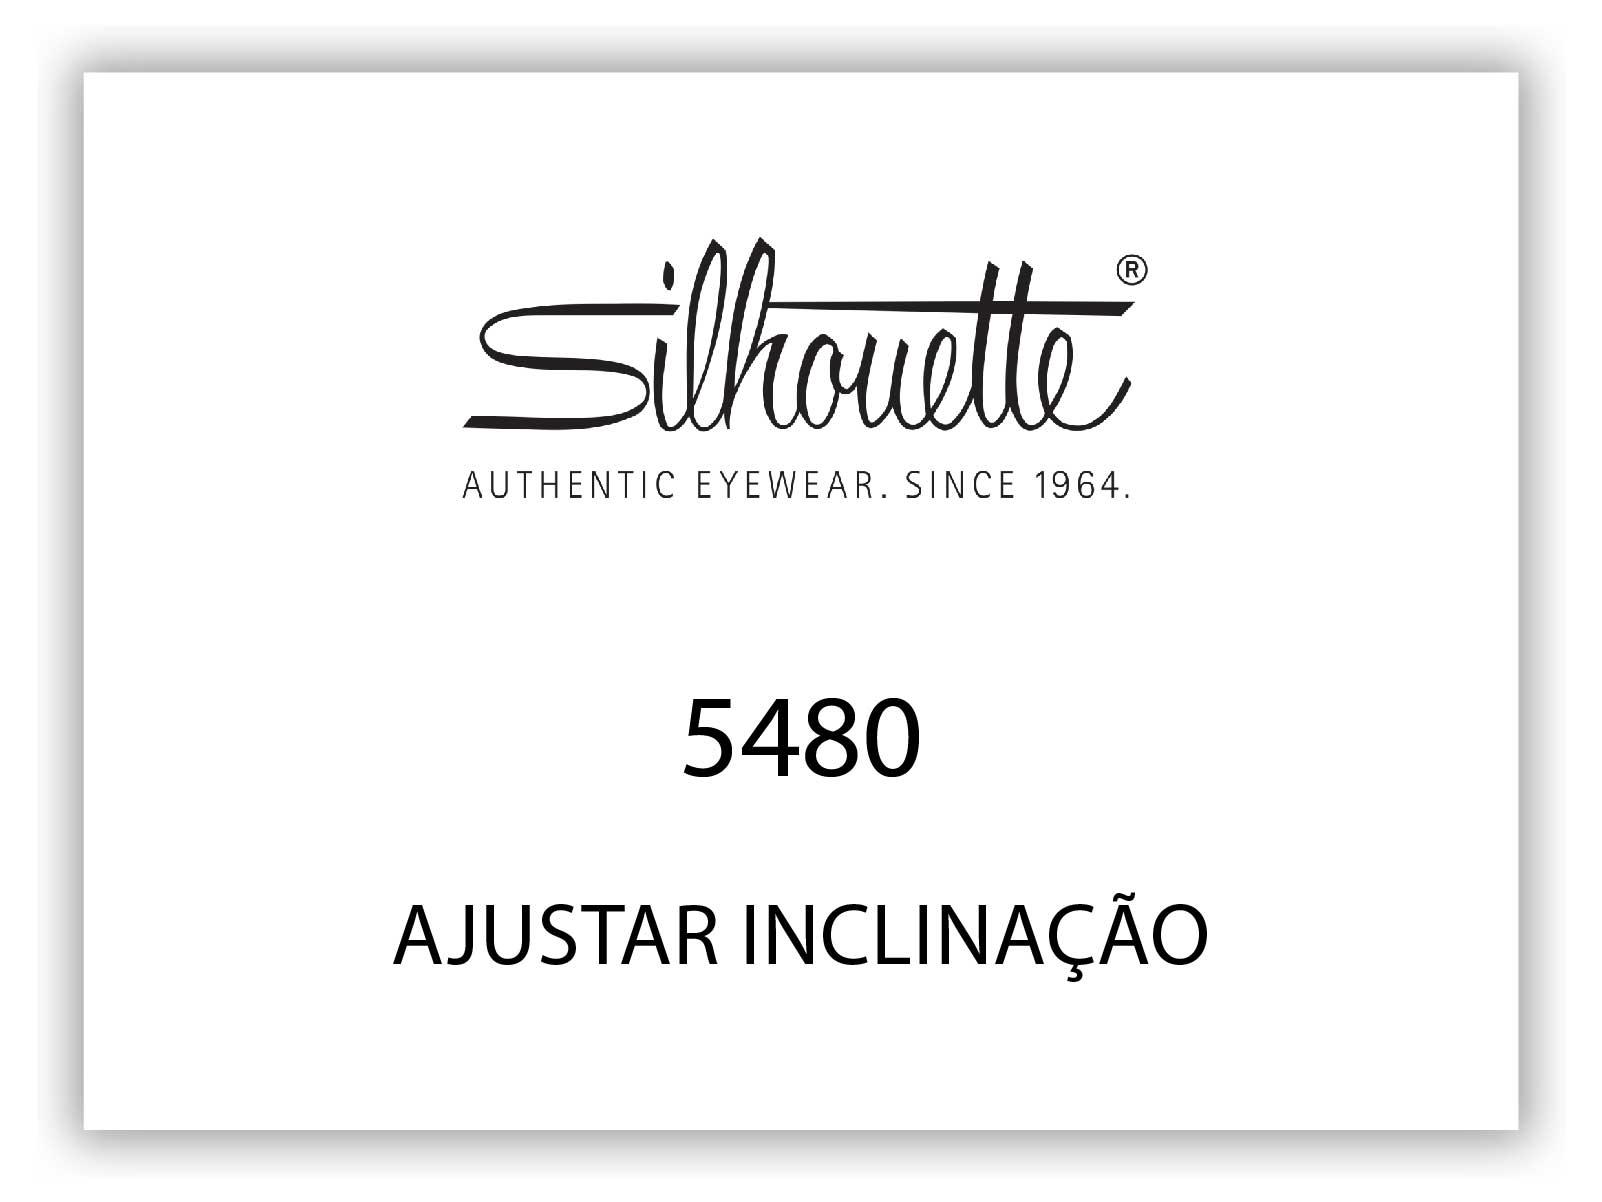 Silhouette_5480-incl-01